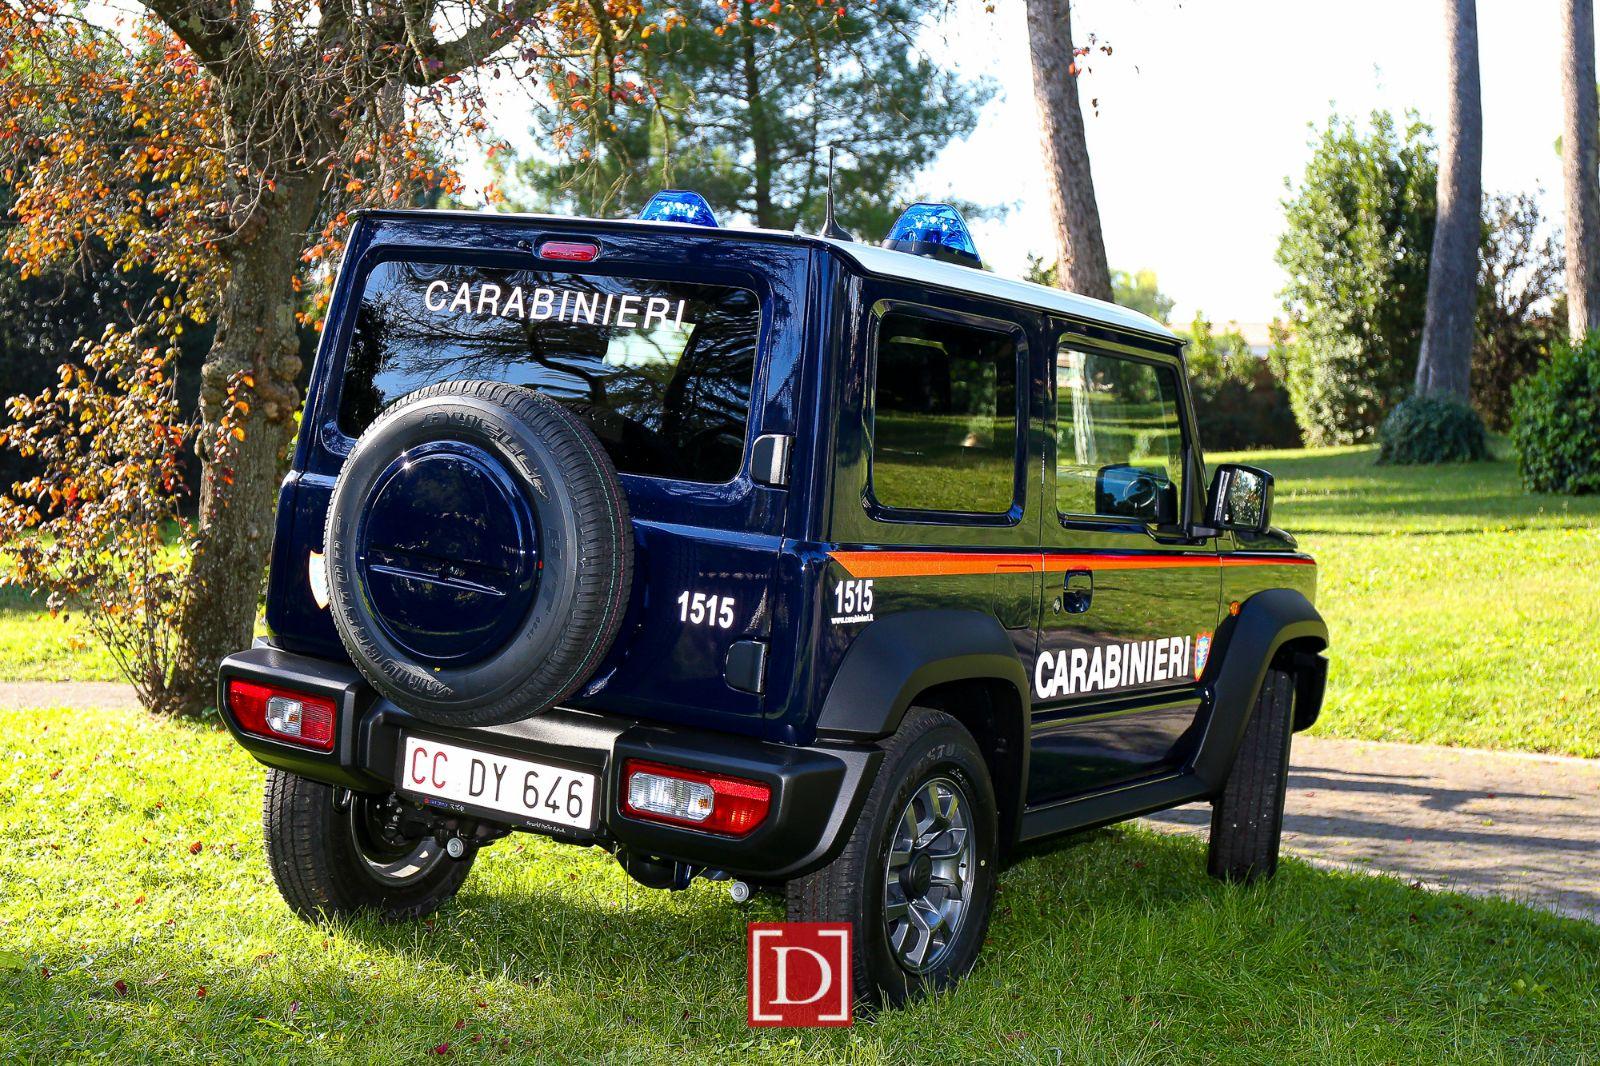 2019-10-23-suzuki-carabinieri-9130